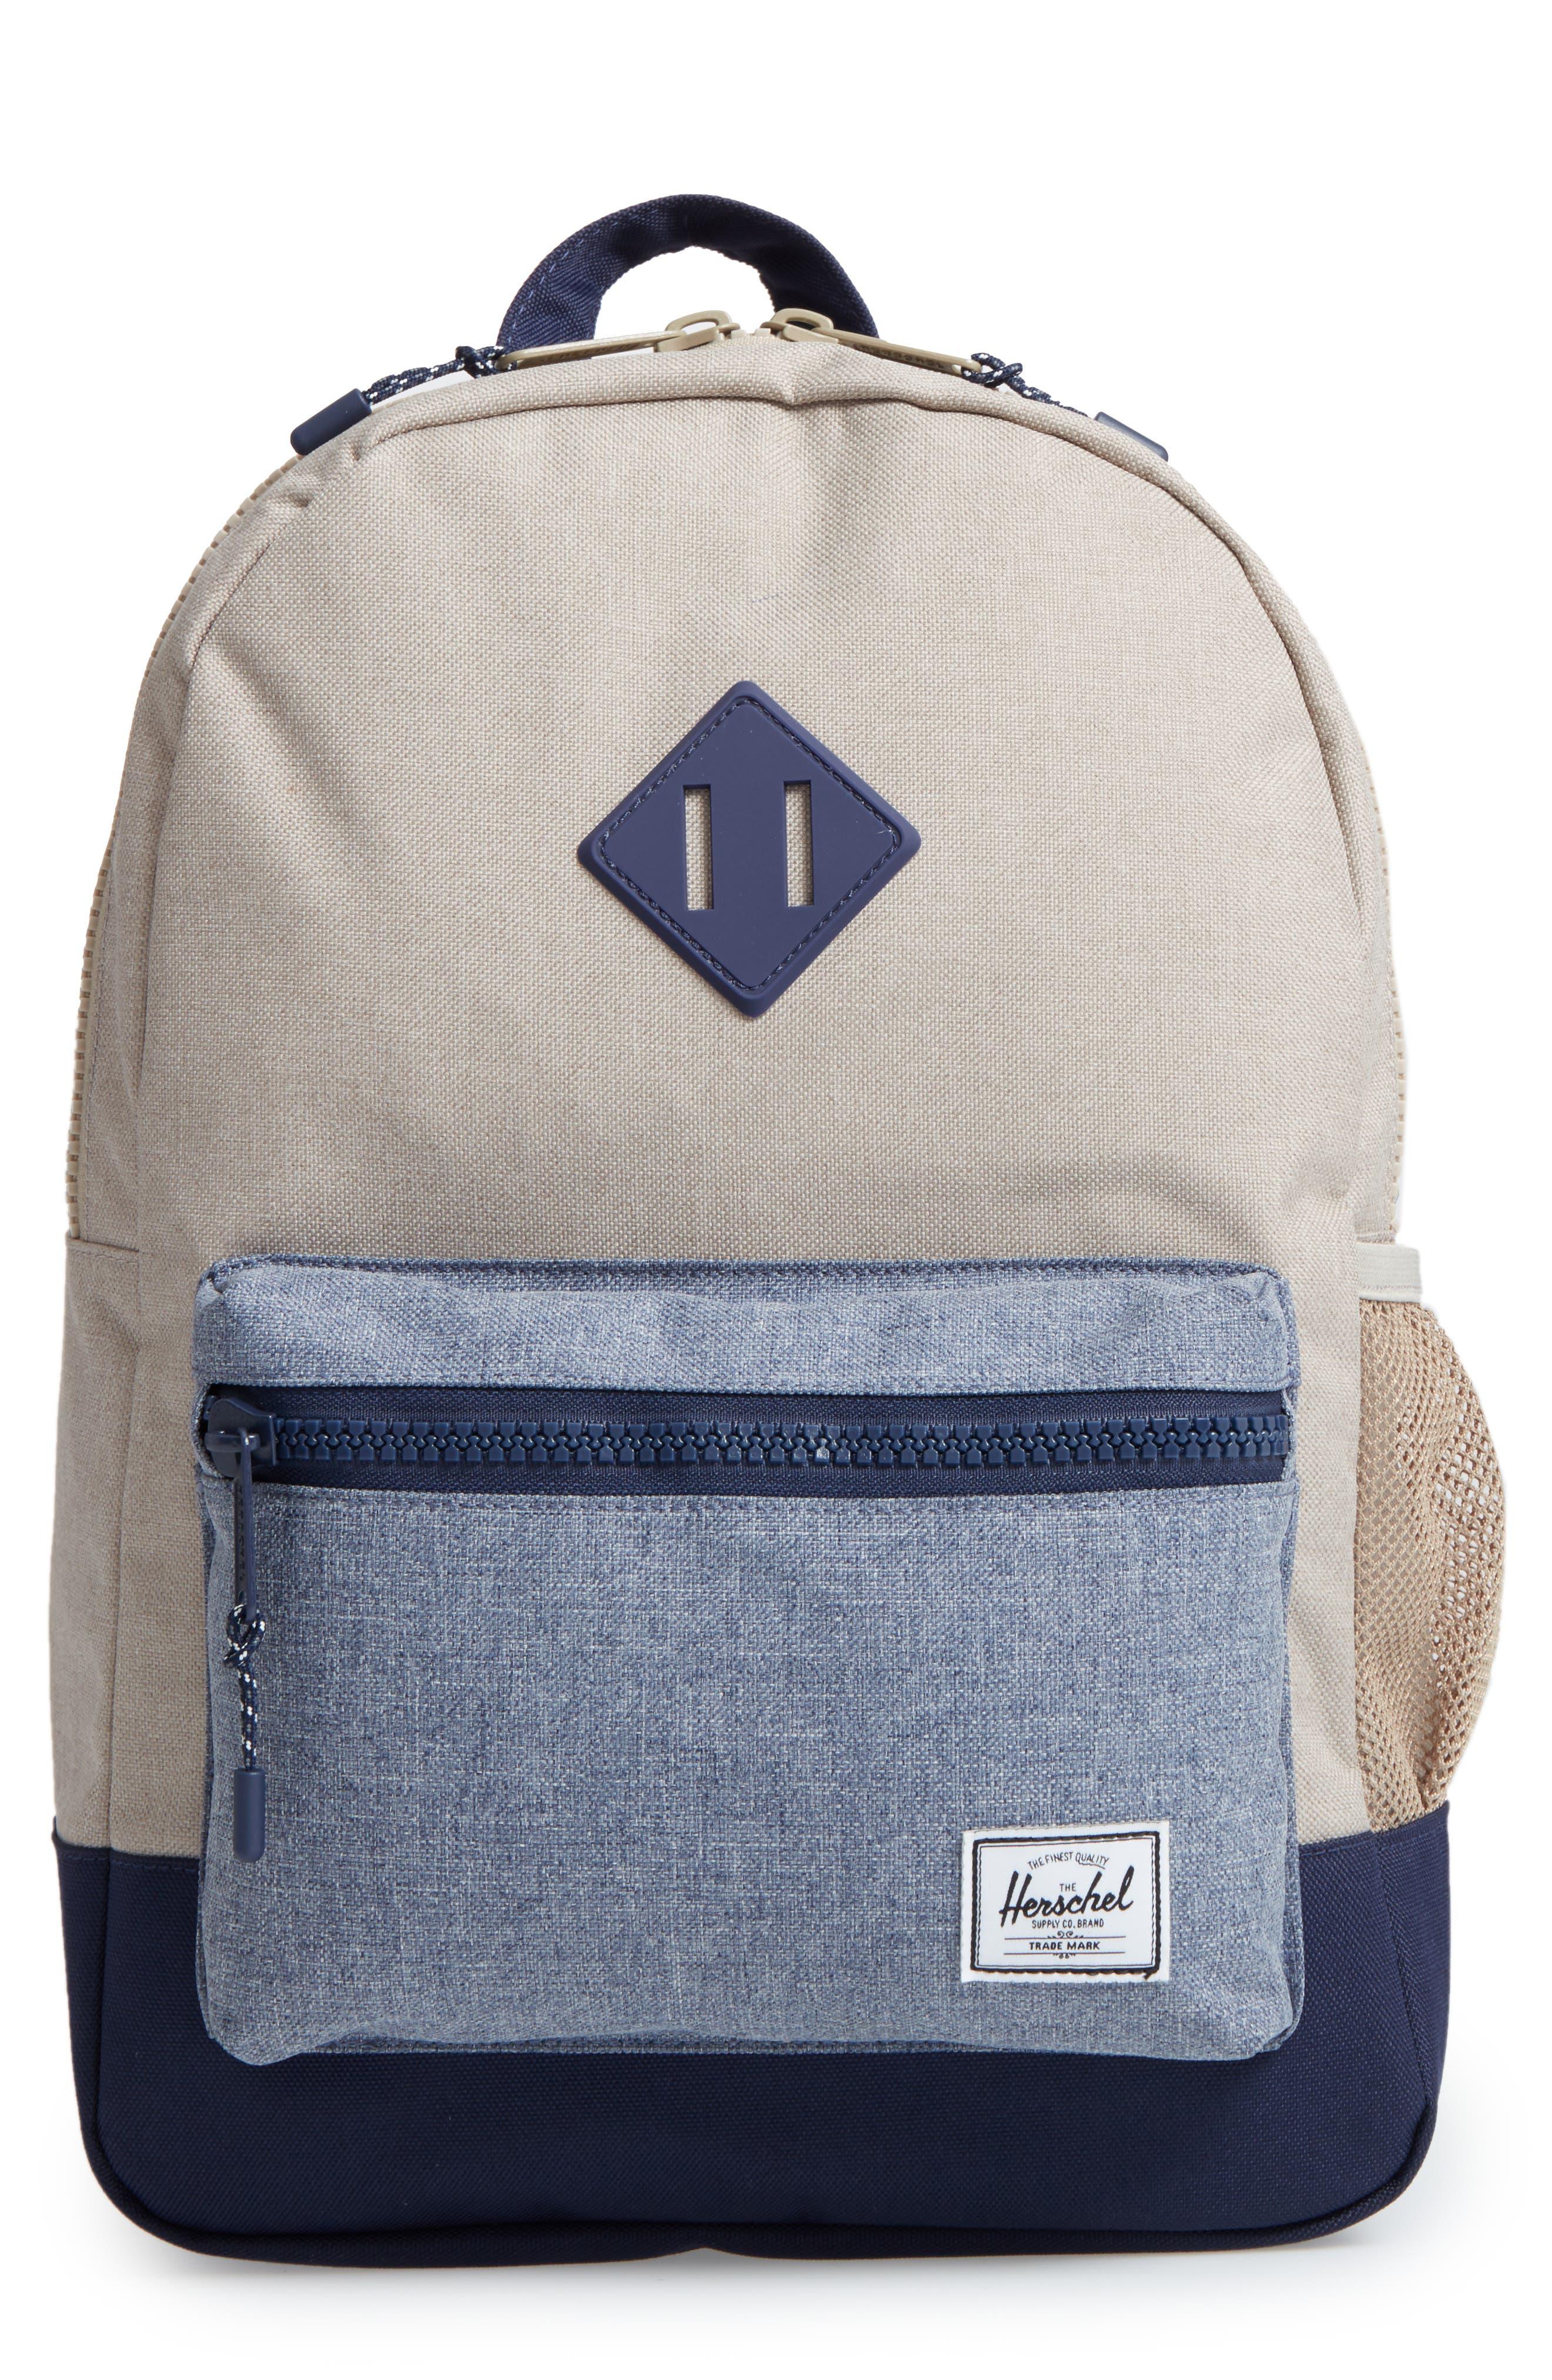 Heritage Backpack,                             Main thumbnail 1, color,                             Khaki Chambray Crosshatch